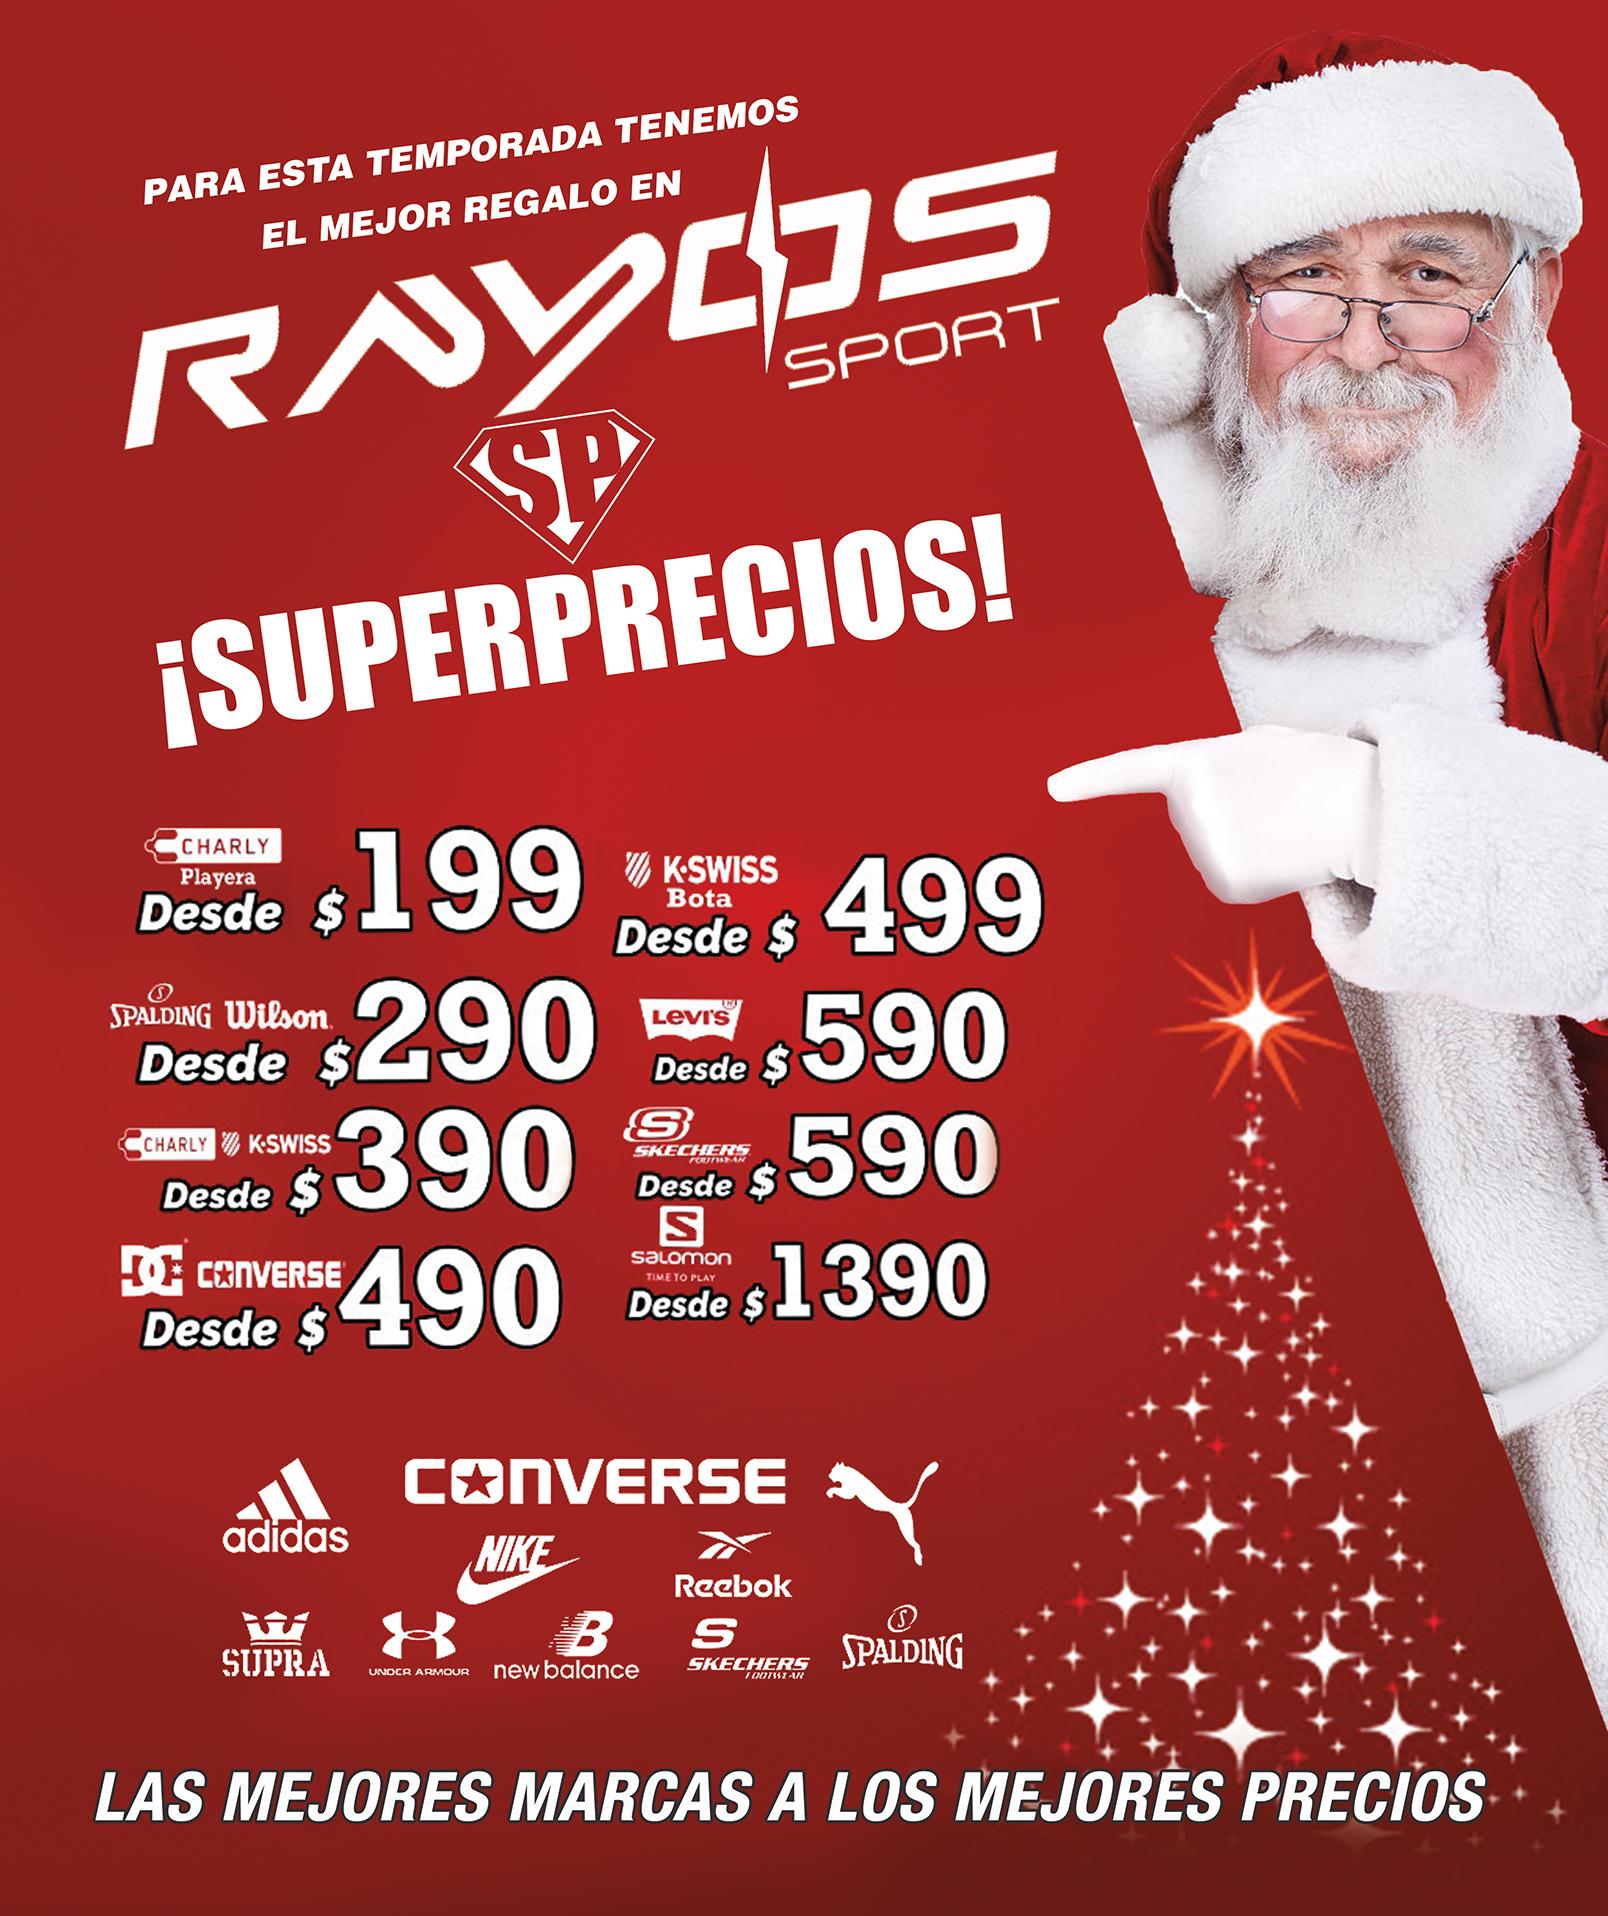 RAYOS SPORT